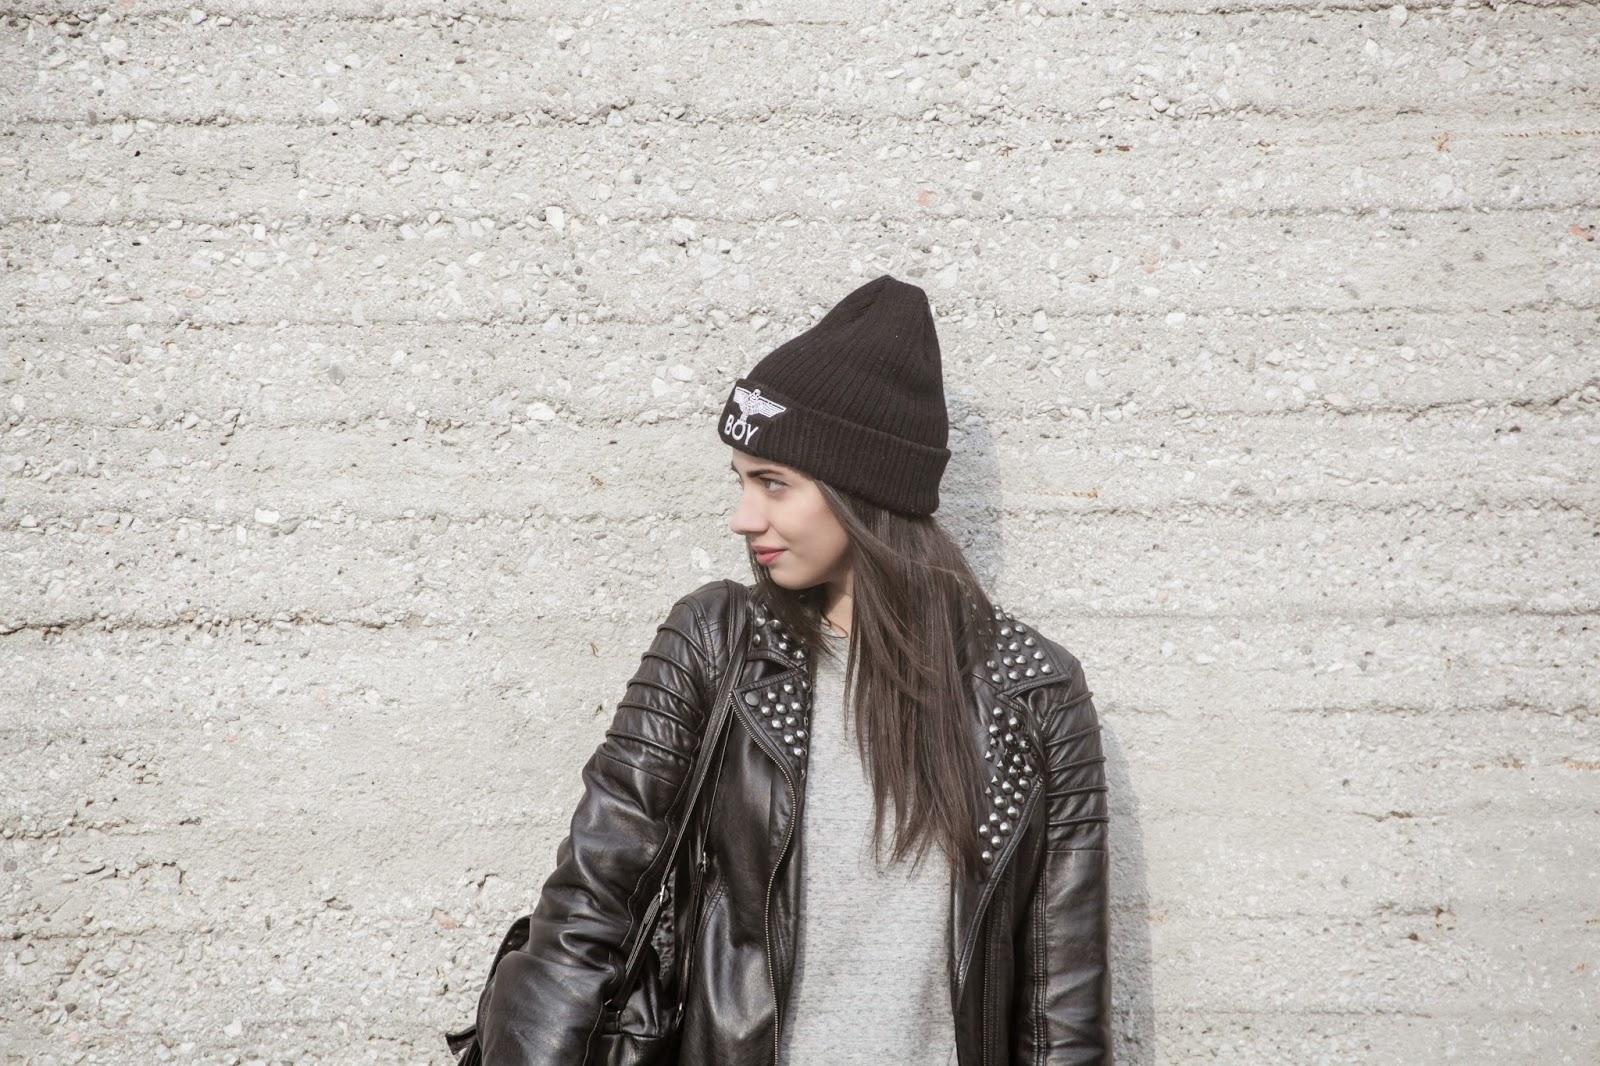 Greek fashion blogger